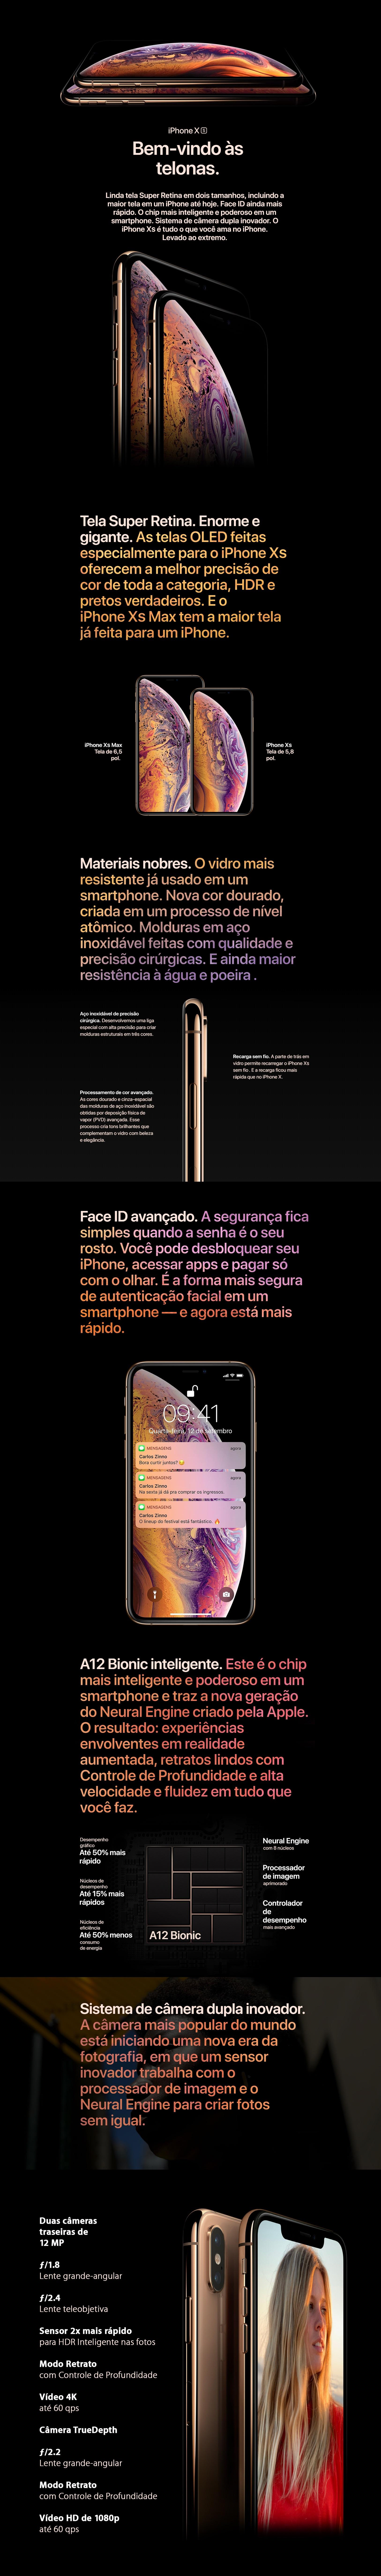 fb9a9e17f65 iPhone Xs Max Apple 64GB Tela Super Retina 6.5'' iOS Câmera 12MP ...